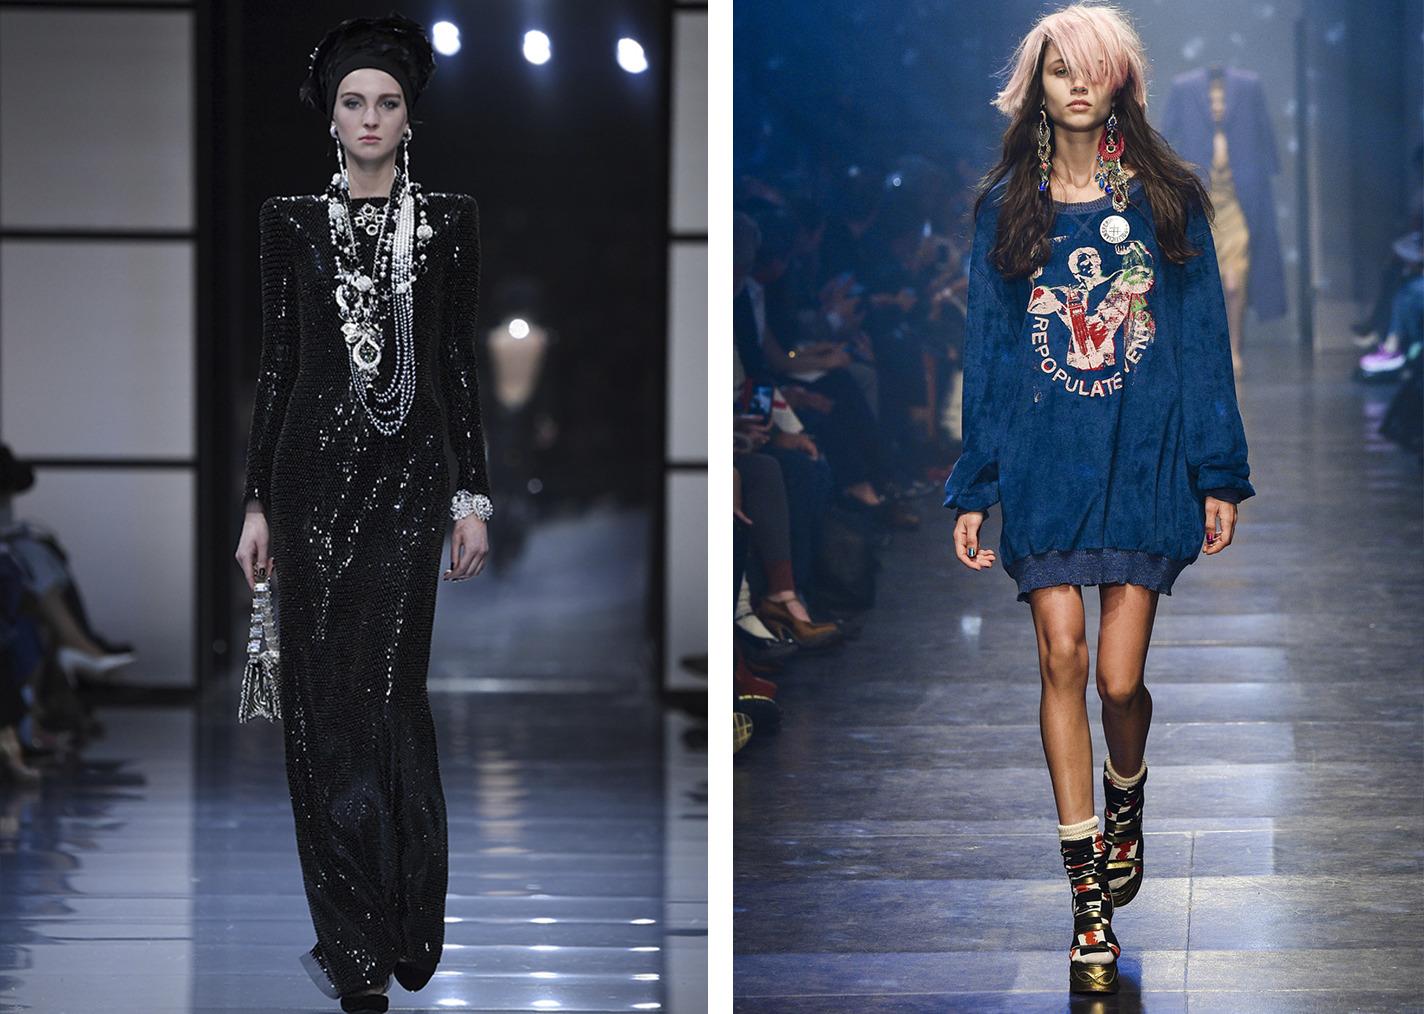 Фото с показа Armani (fw-daily.com), Vivienne Westwood (elle.ru)